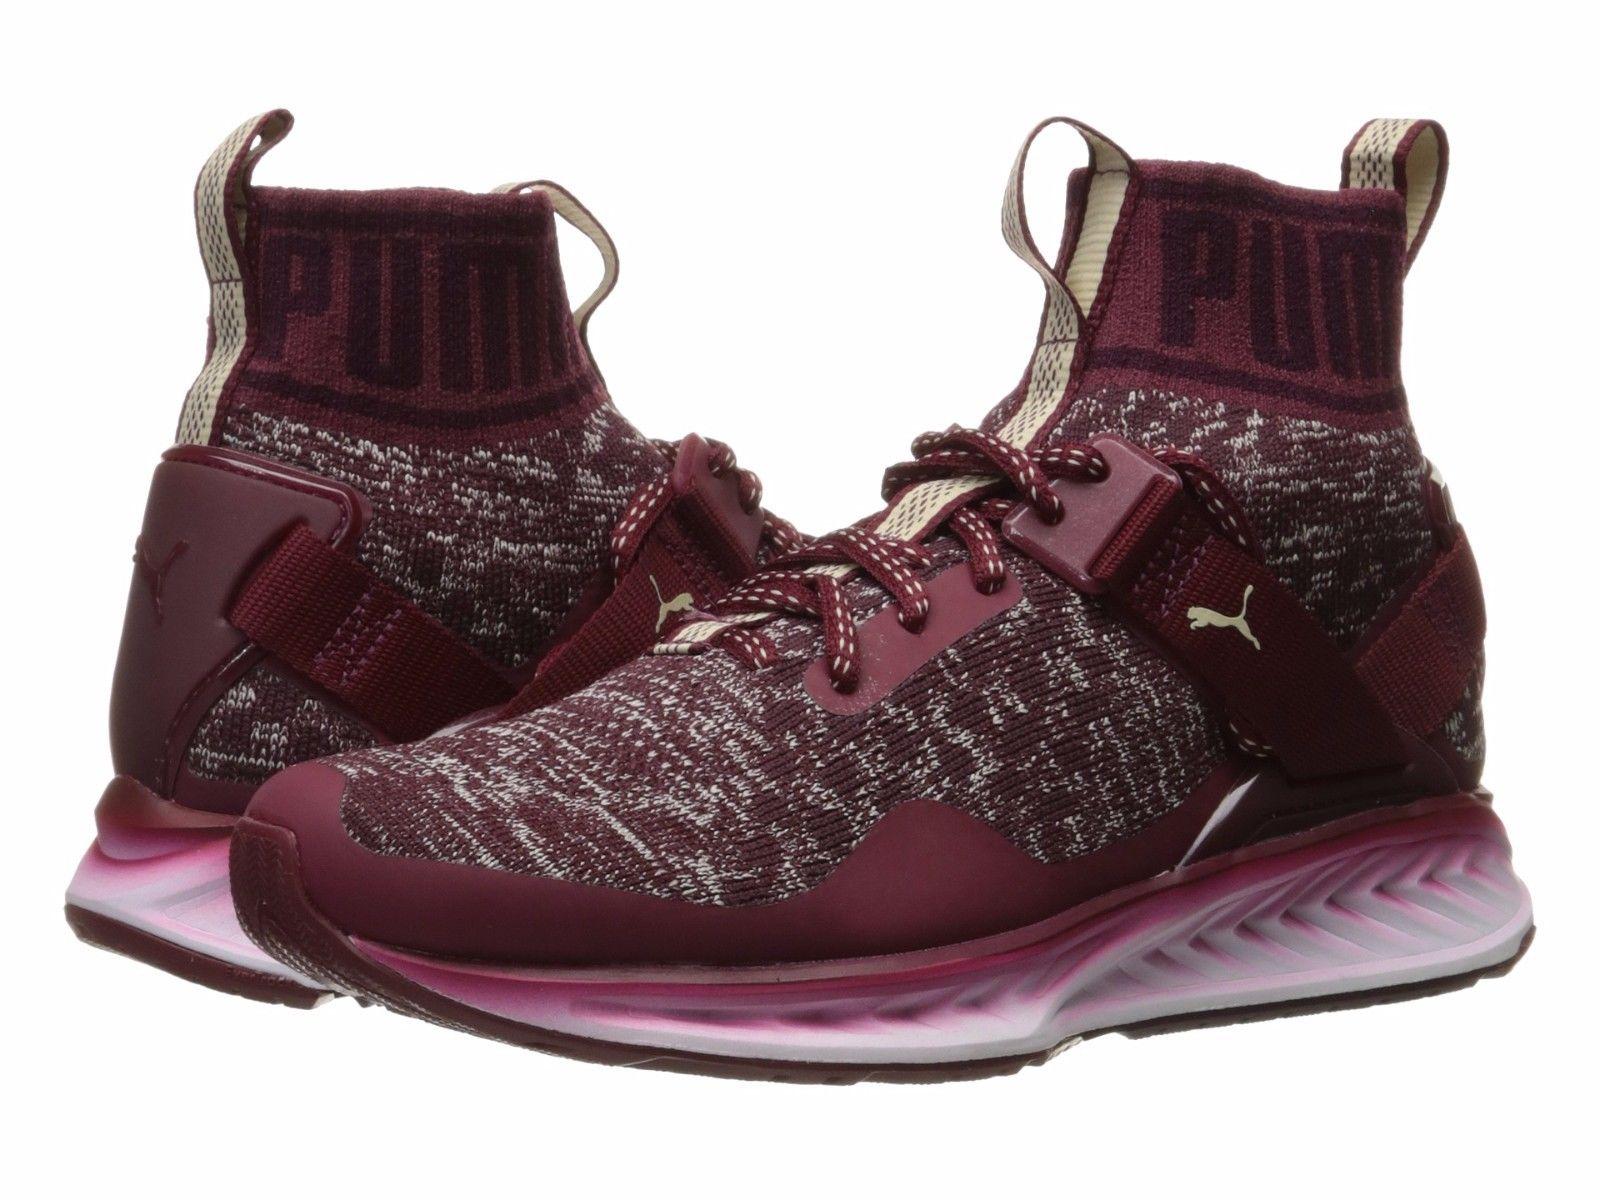 PUMA Men's Ignite evoKNIT Fade Training Sneakers